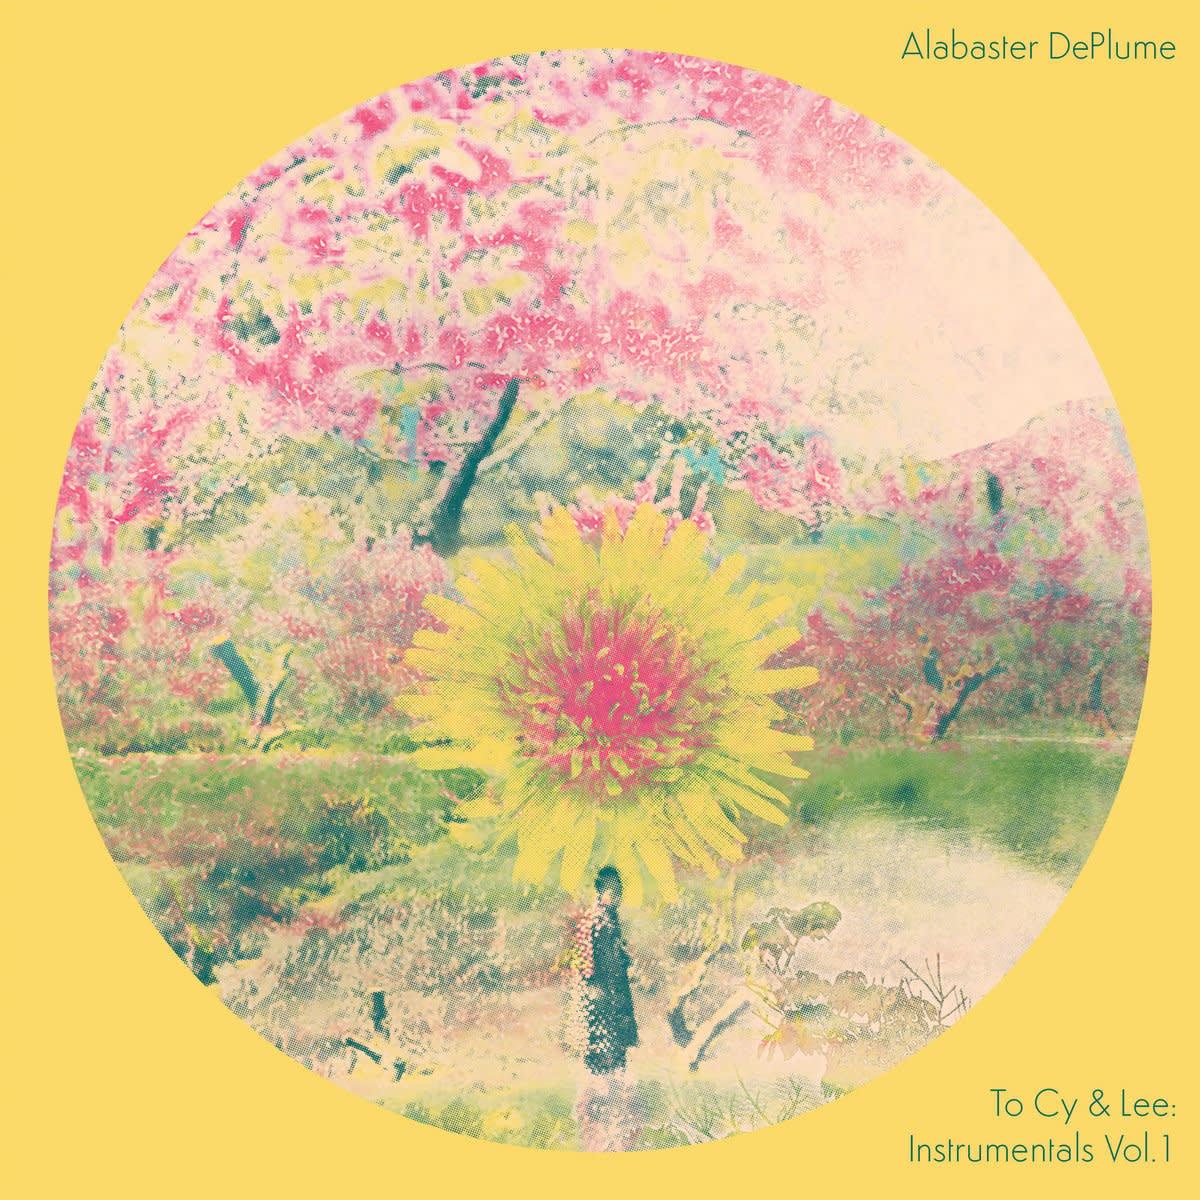 Alabaster DePlume • To Cy & Lee: Instrumentals Vol. 1-1